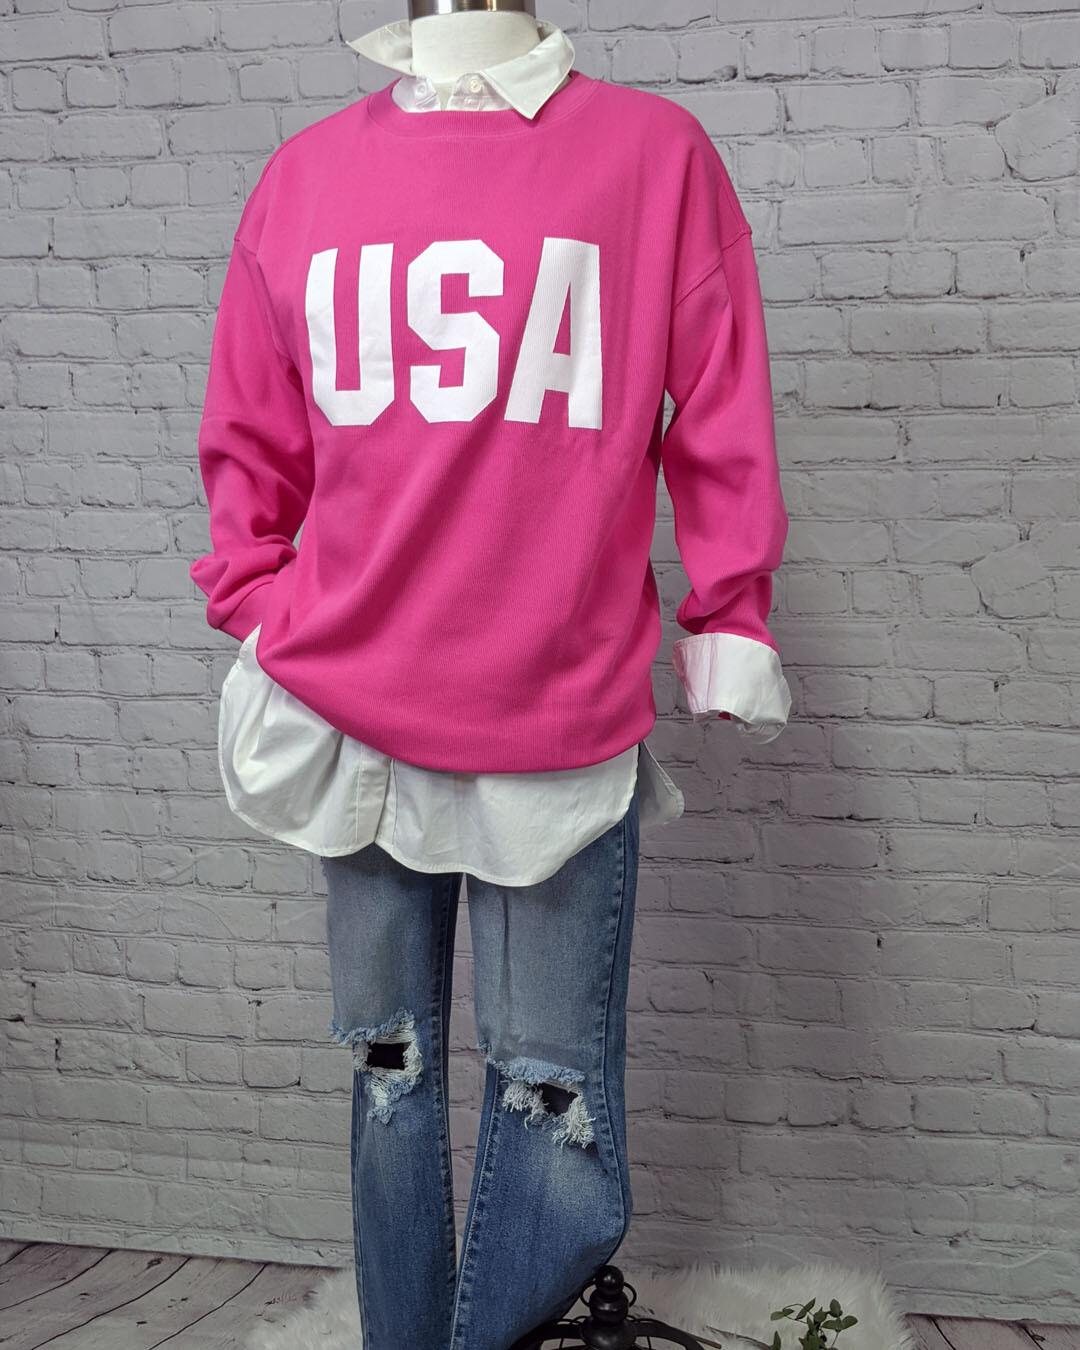 Candy Sweatshirt by Mazik